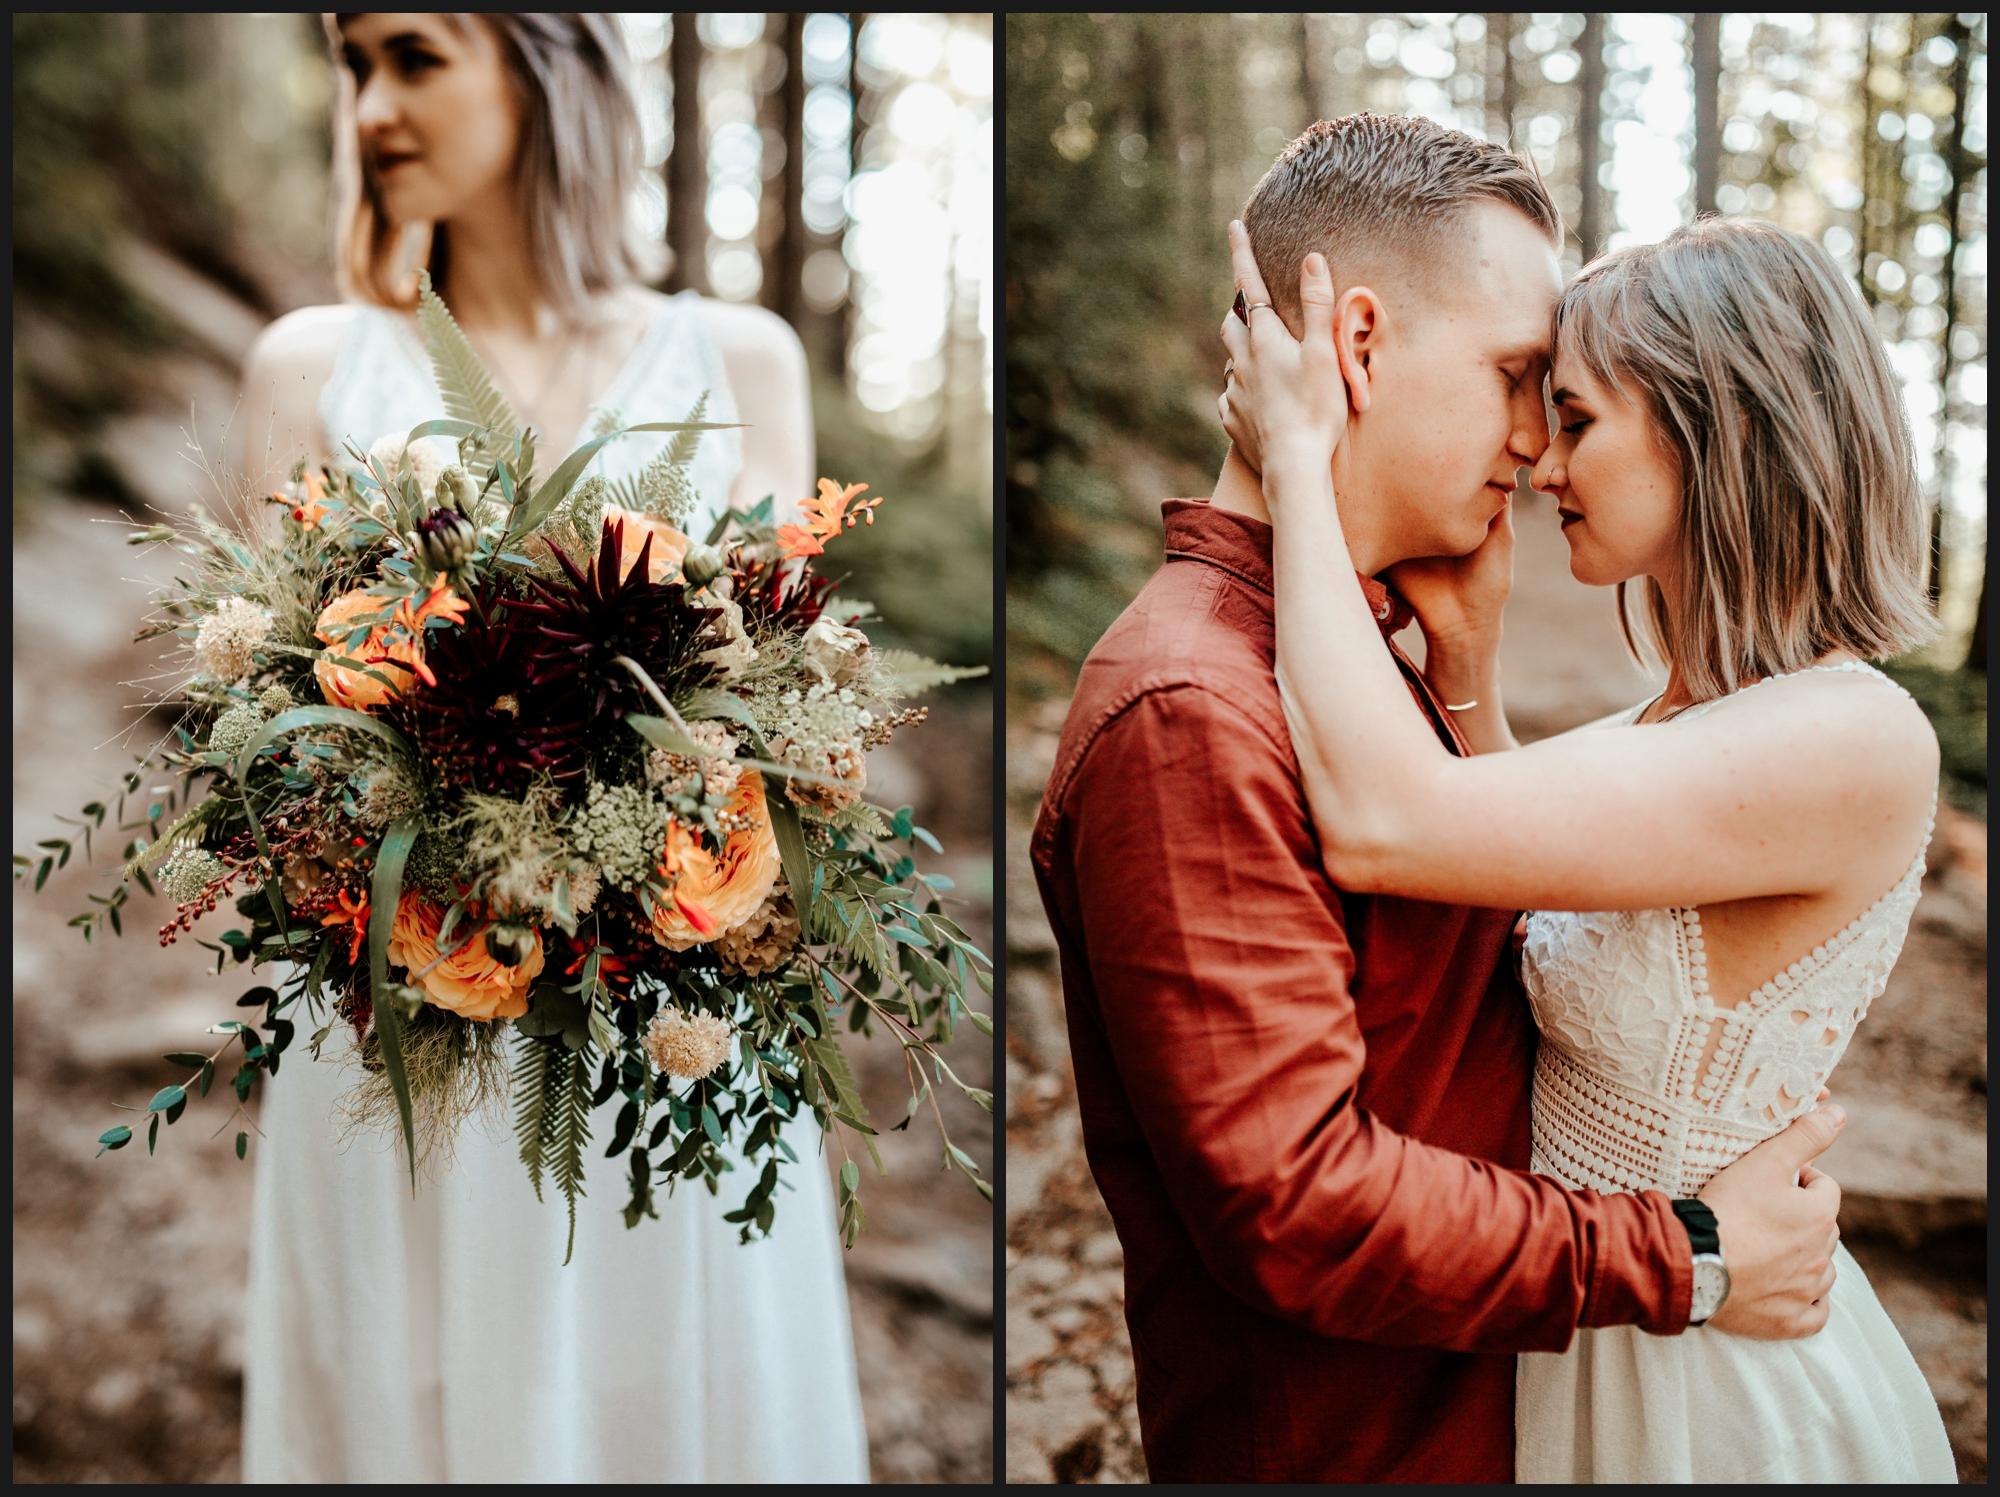 Orlando-Wedding-Photographer-destination-wedding-photographer-florida-wedding-photographer-bohemian-wedding-photographer_0393.jpg